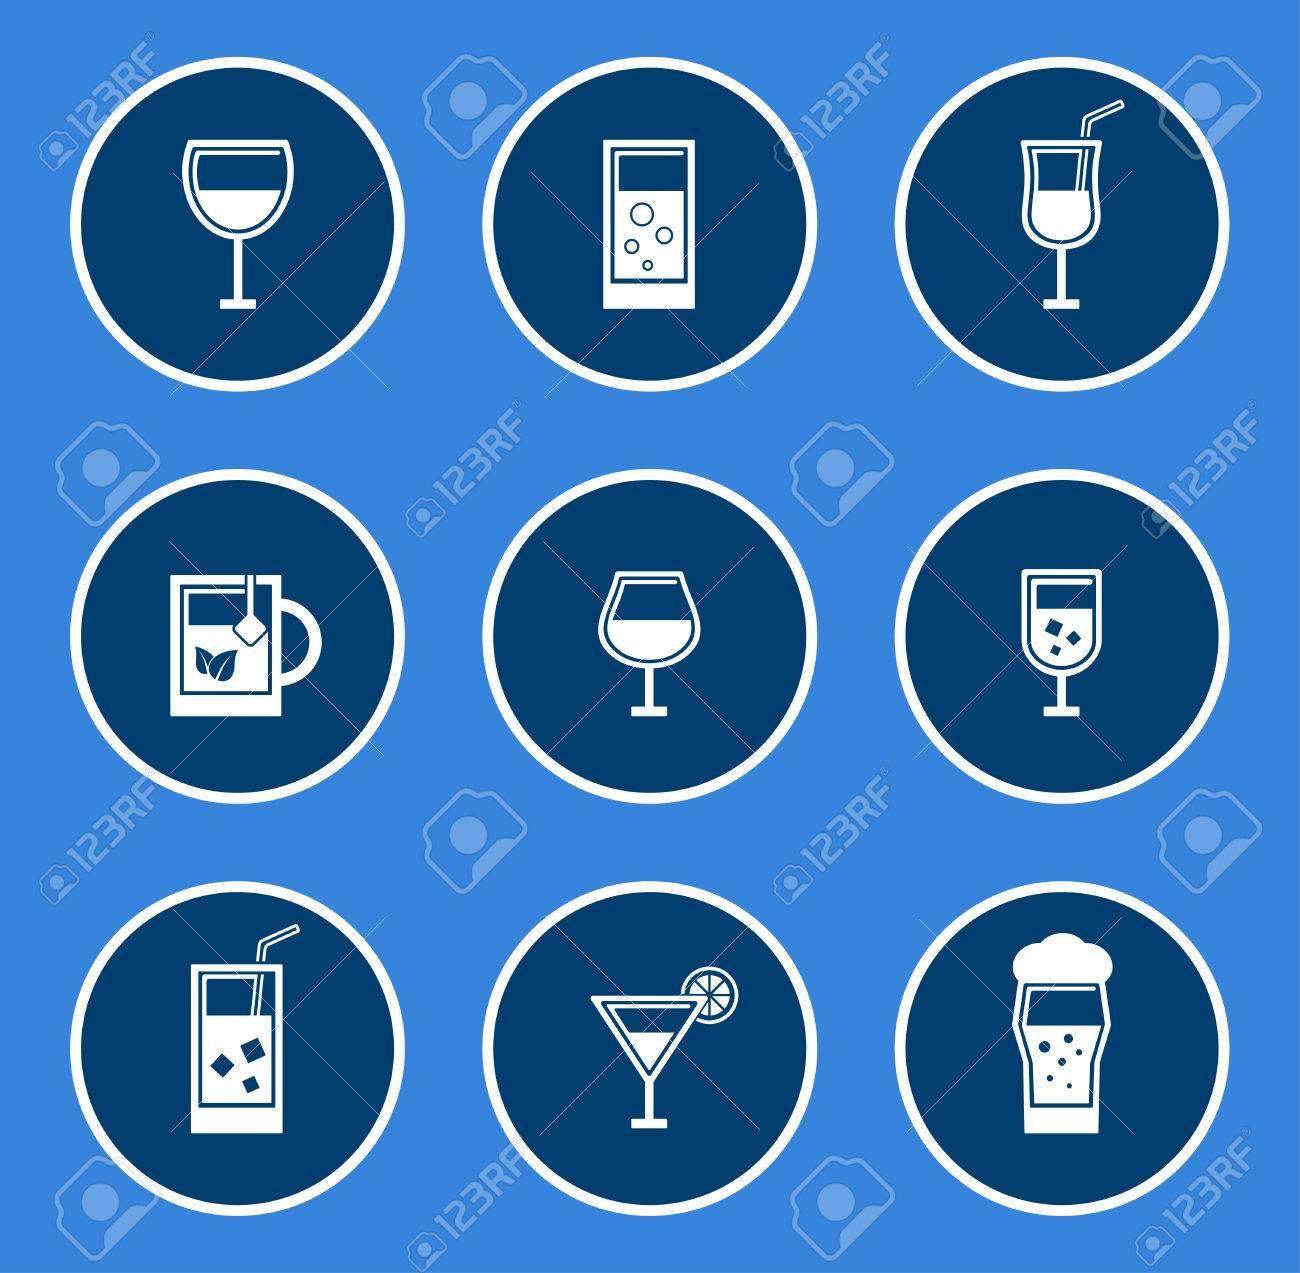 round glasses icon set on blue background - 51308236